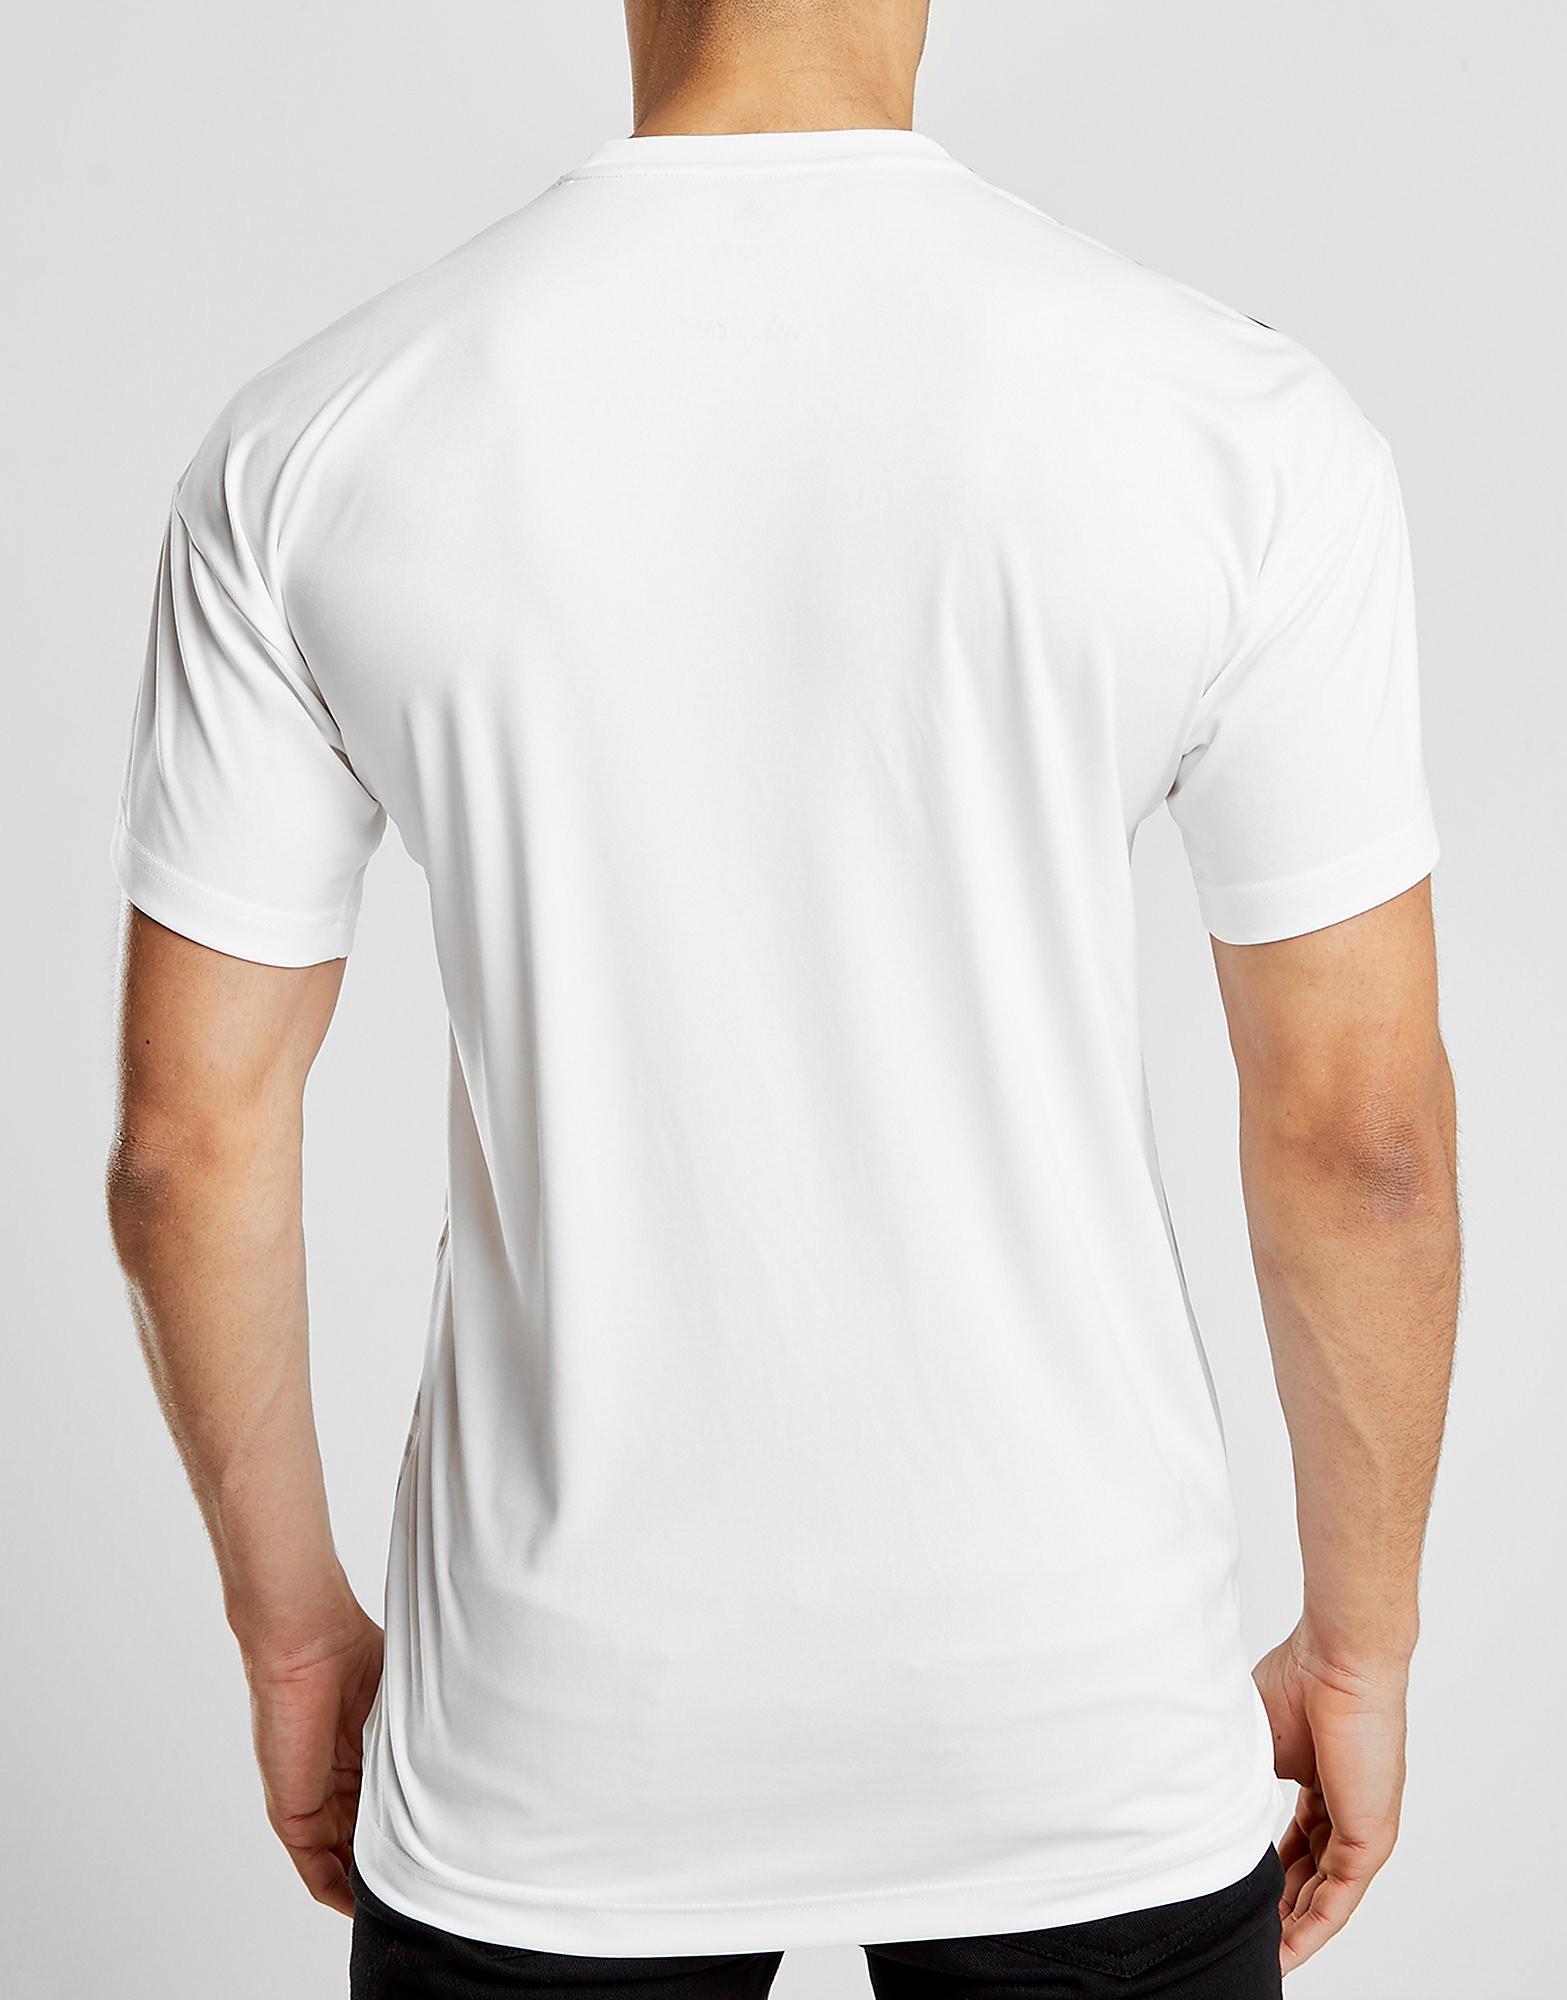 adidas Northern Ireland 2018 Pre-Match Shirt